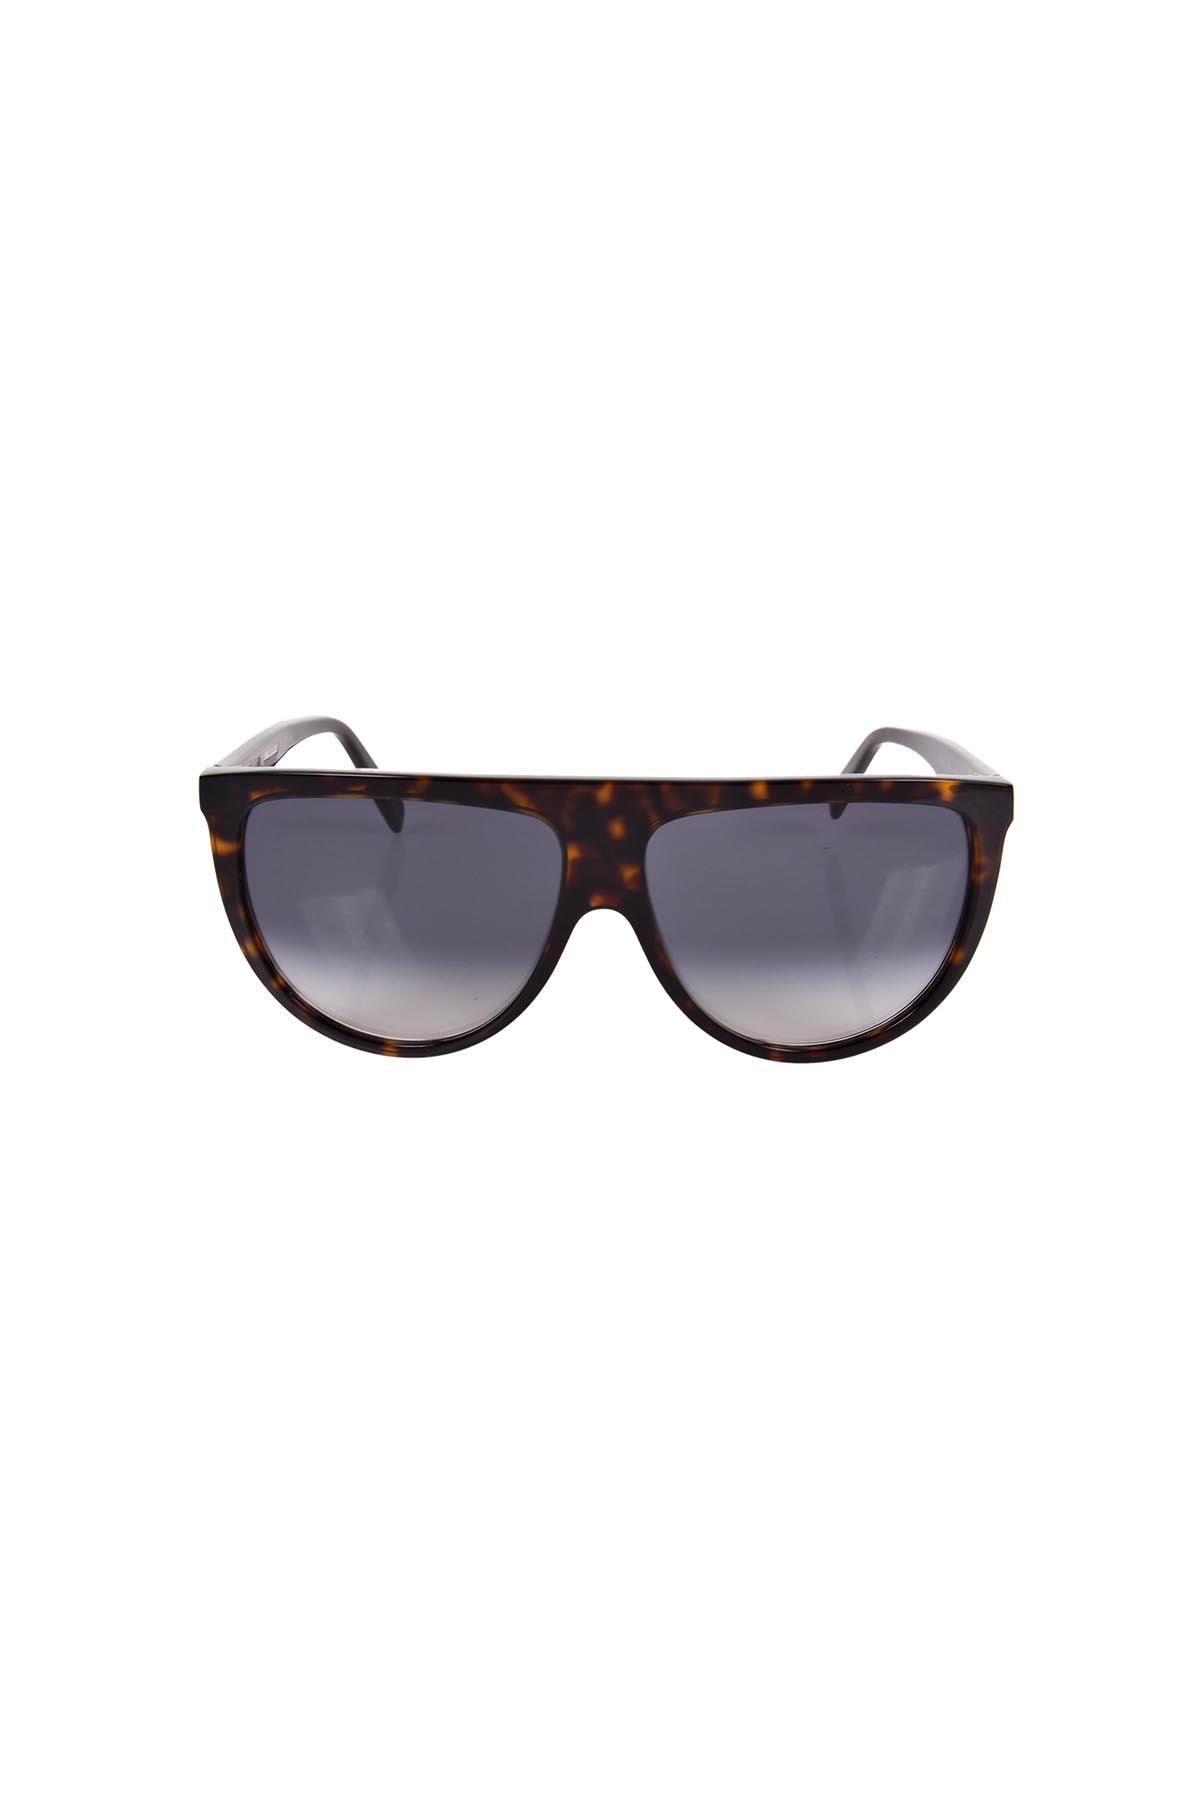 2c1cb0454ea Celine Thin Shadow Sunglasses In 19Dt Dark Havana